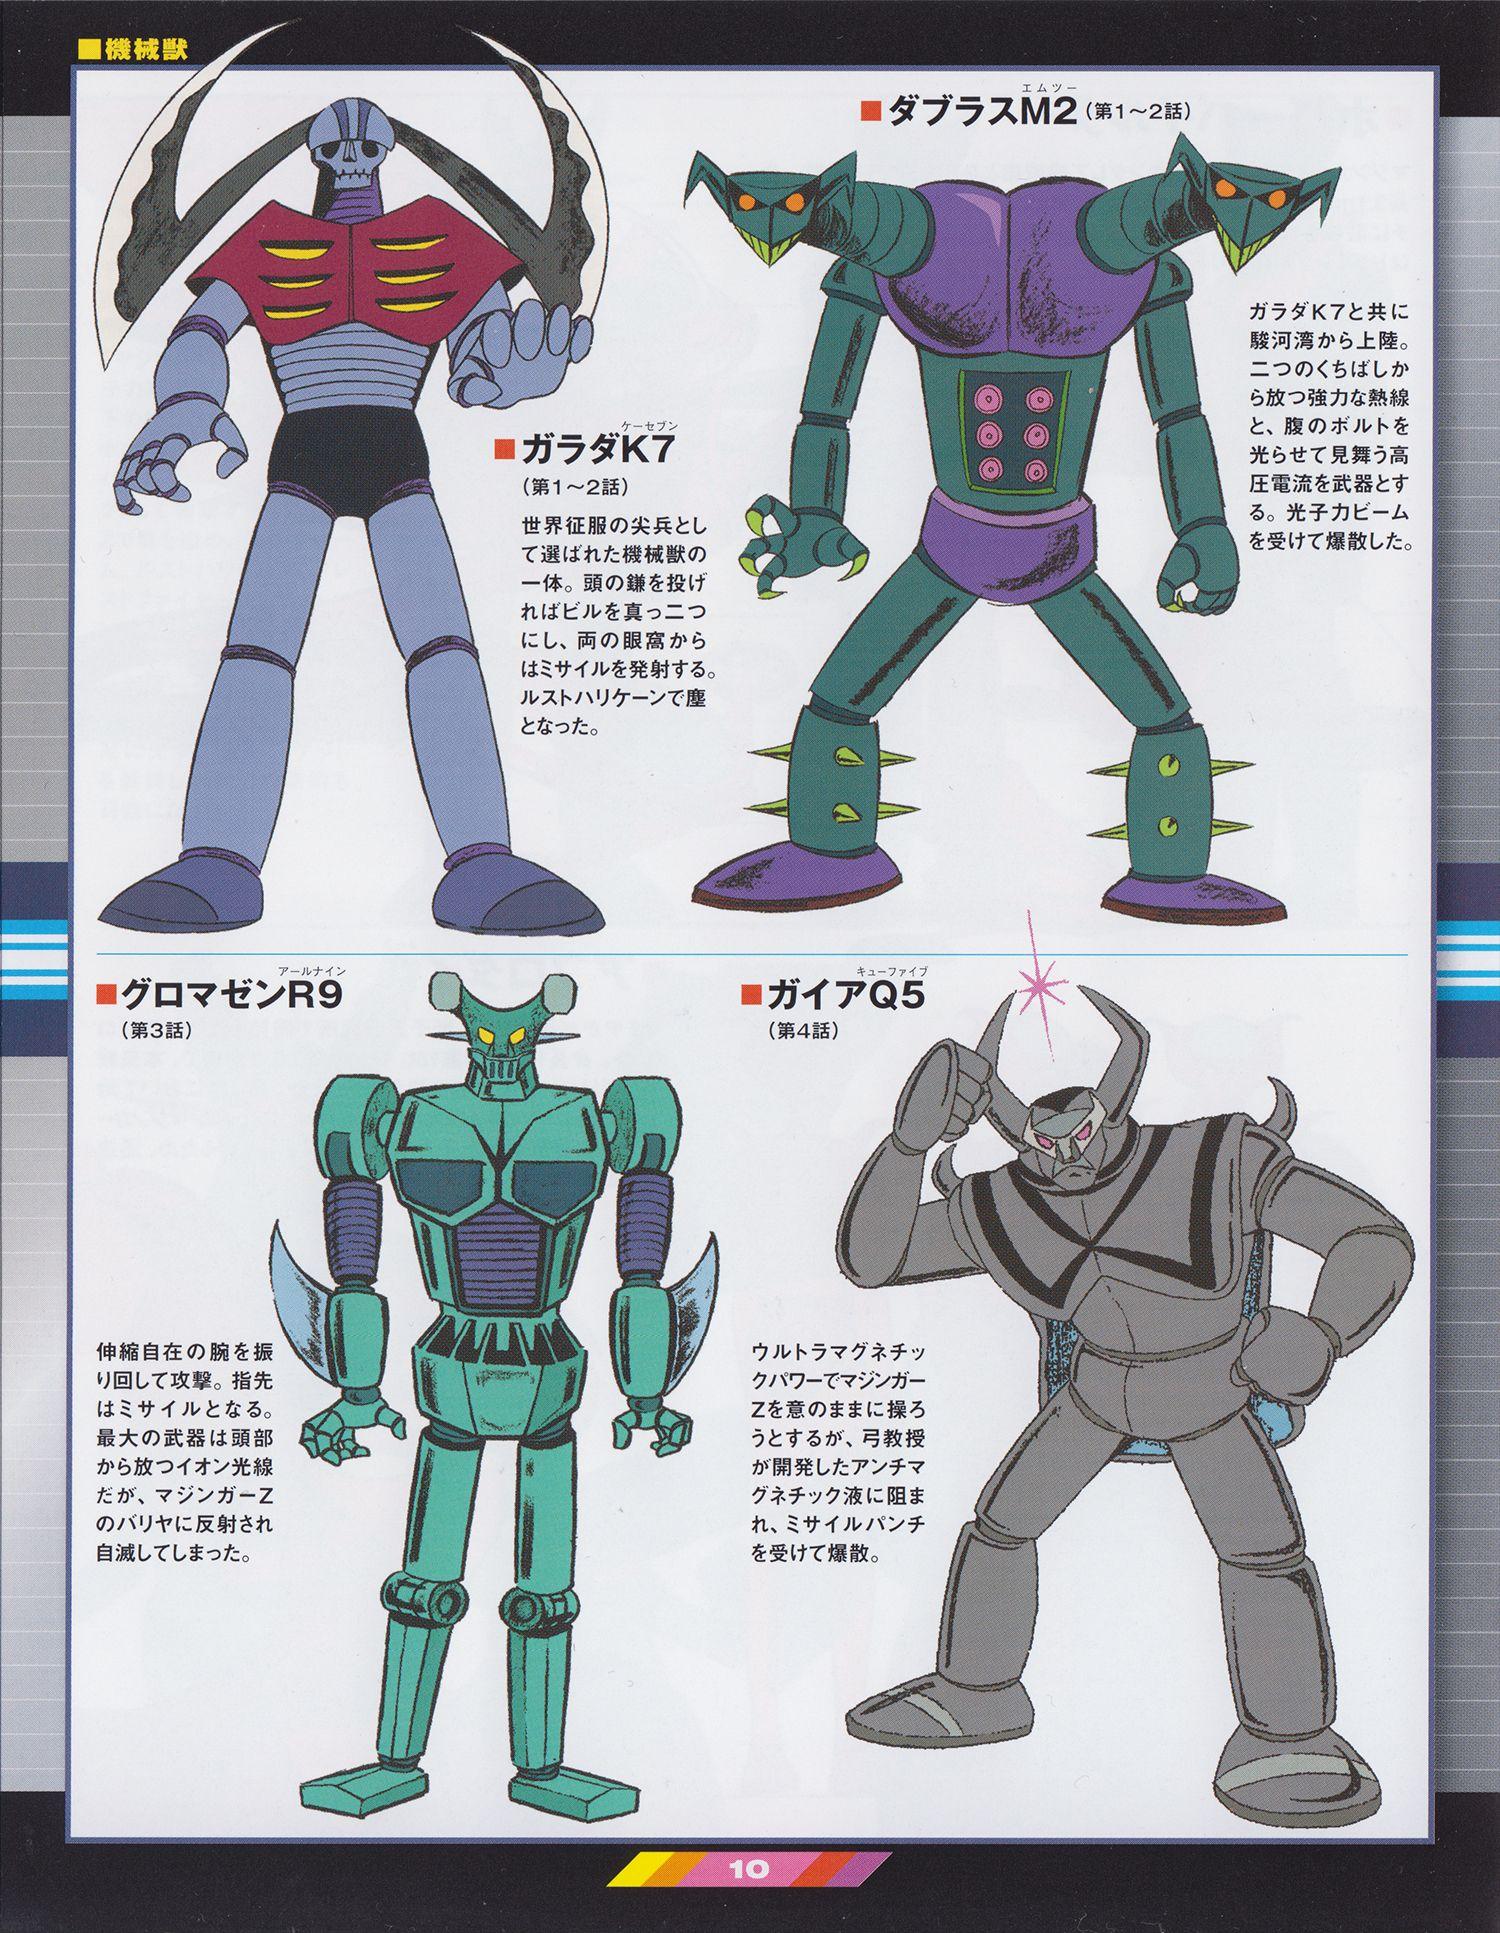 Mazinger Z Japon/és Super Robot Manga Ni/ño Cl/ásico Lonchera Bolsa Escolar